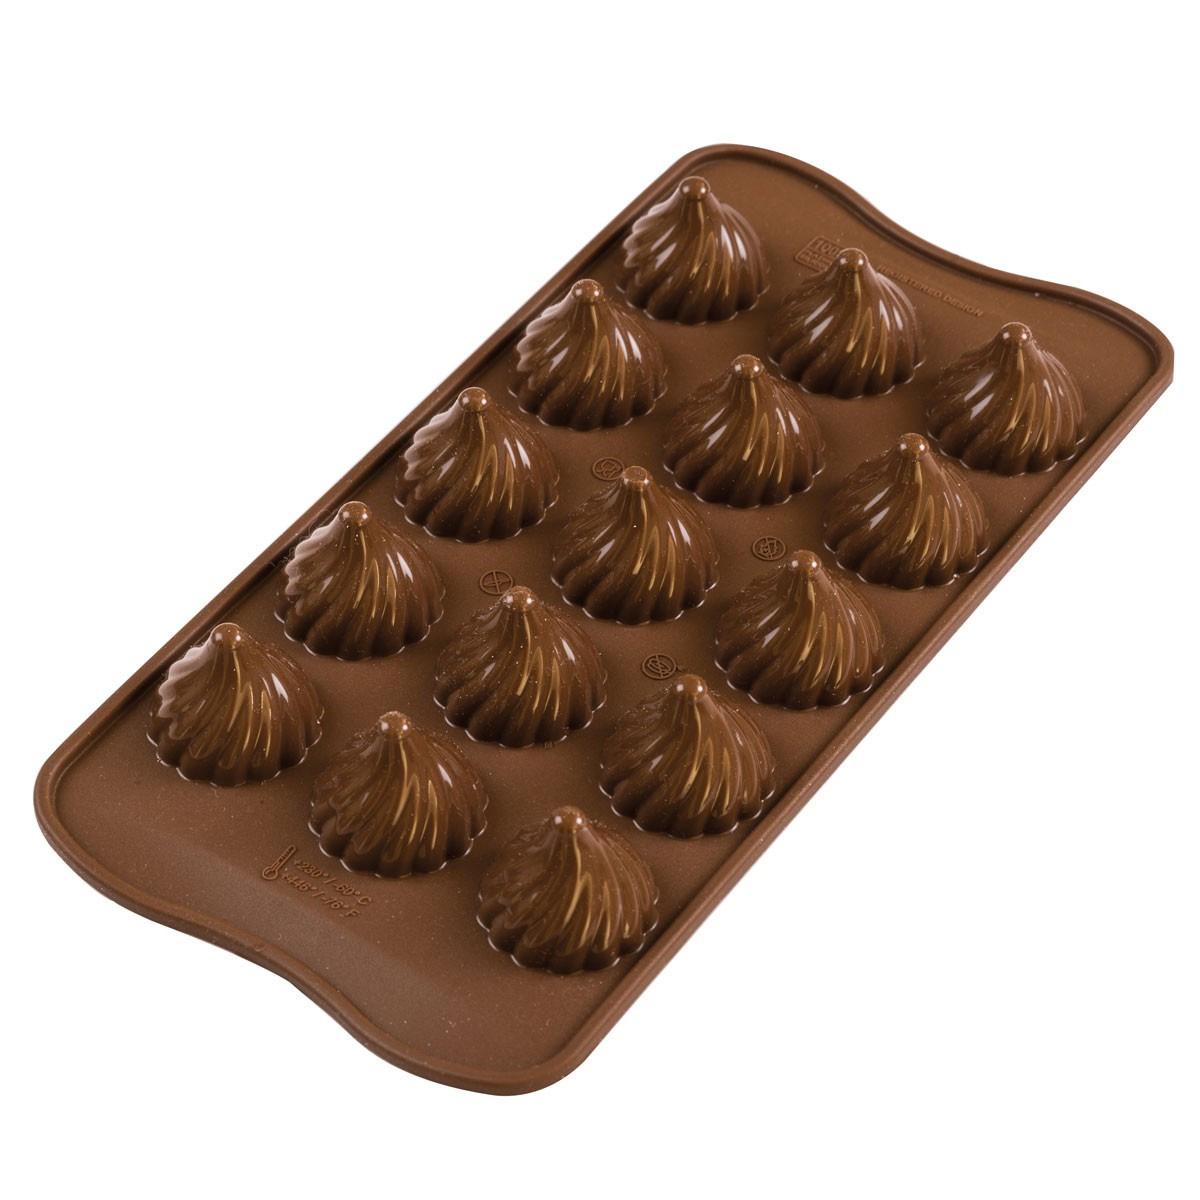 Siliconen Chocoladevorm - Choco Flame 3D